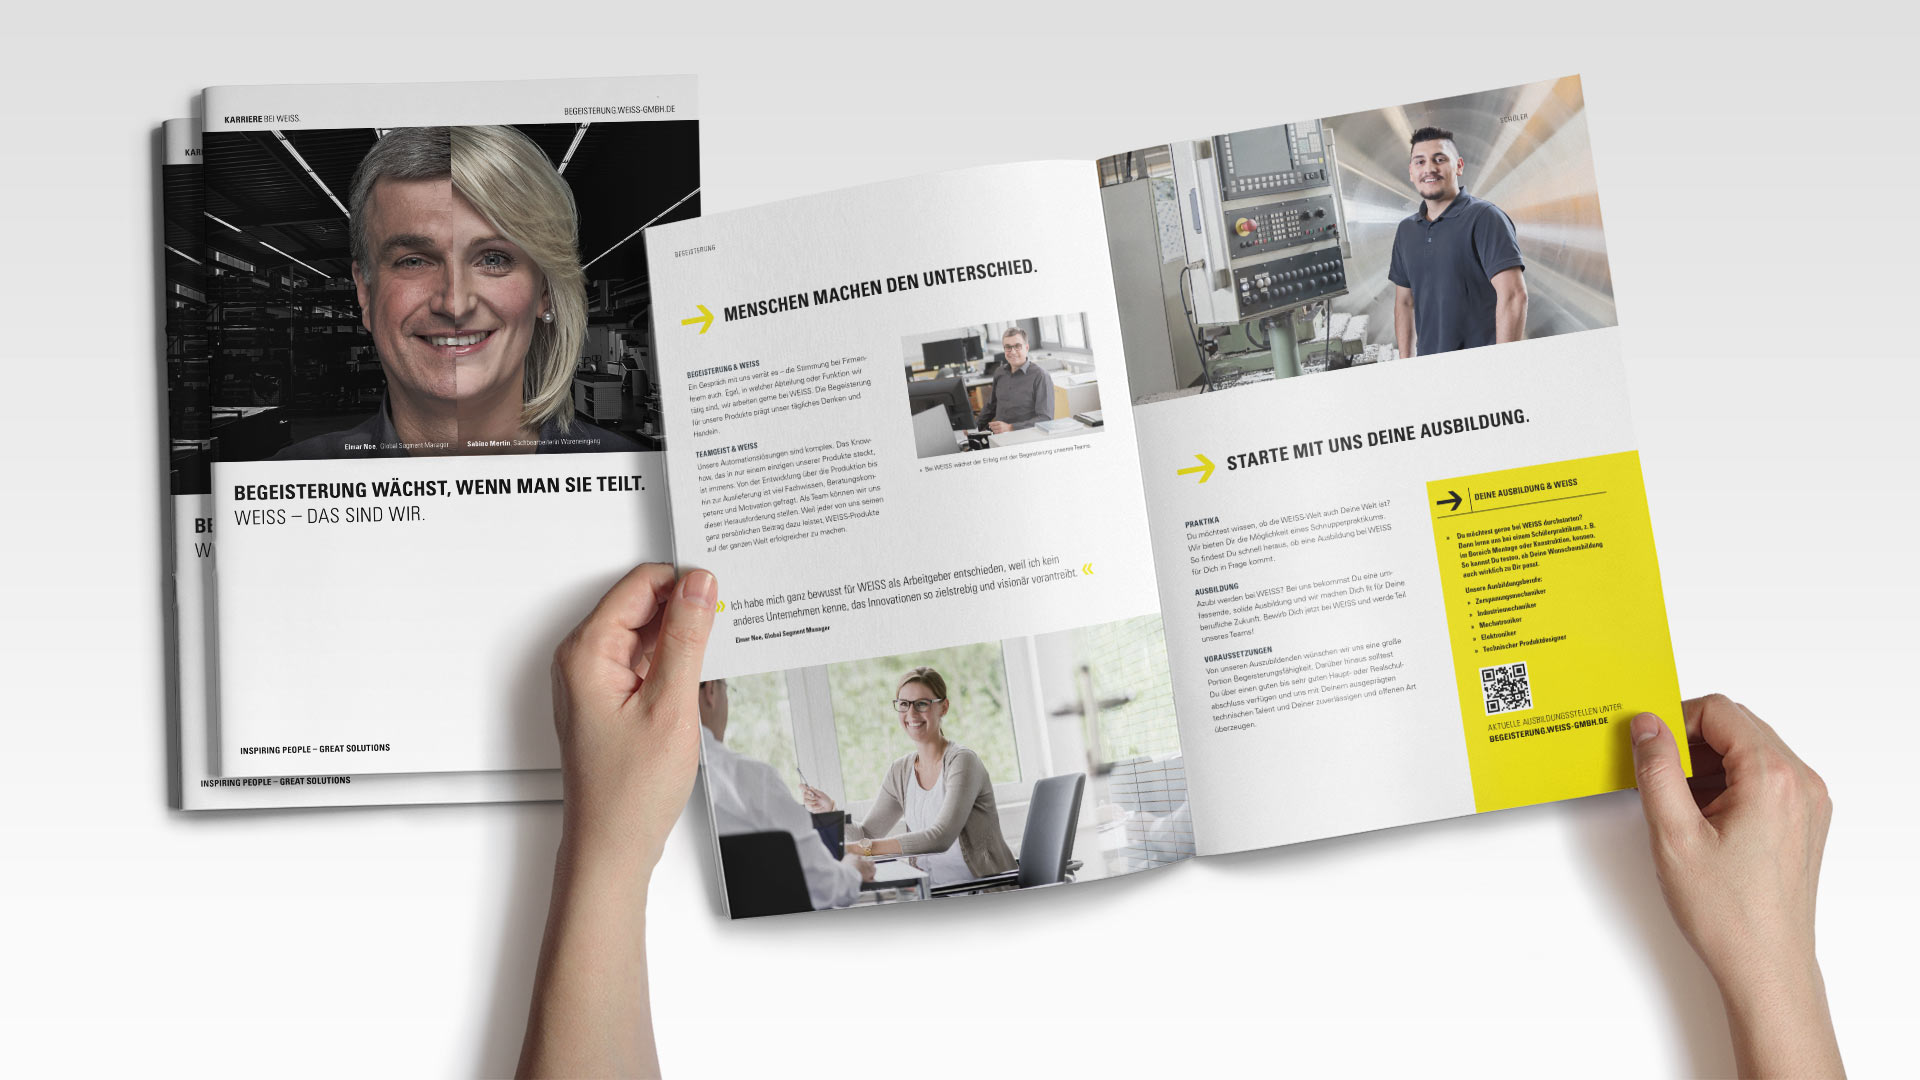 OPUS Marketing / Projekt / Karriere bei WEISS / Arbeitgeberbroschuere